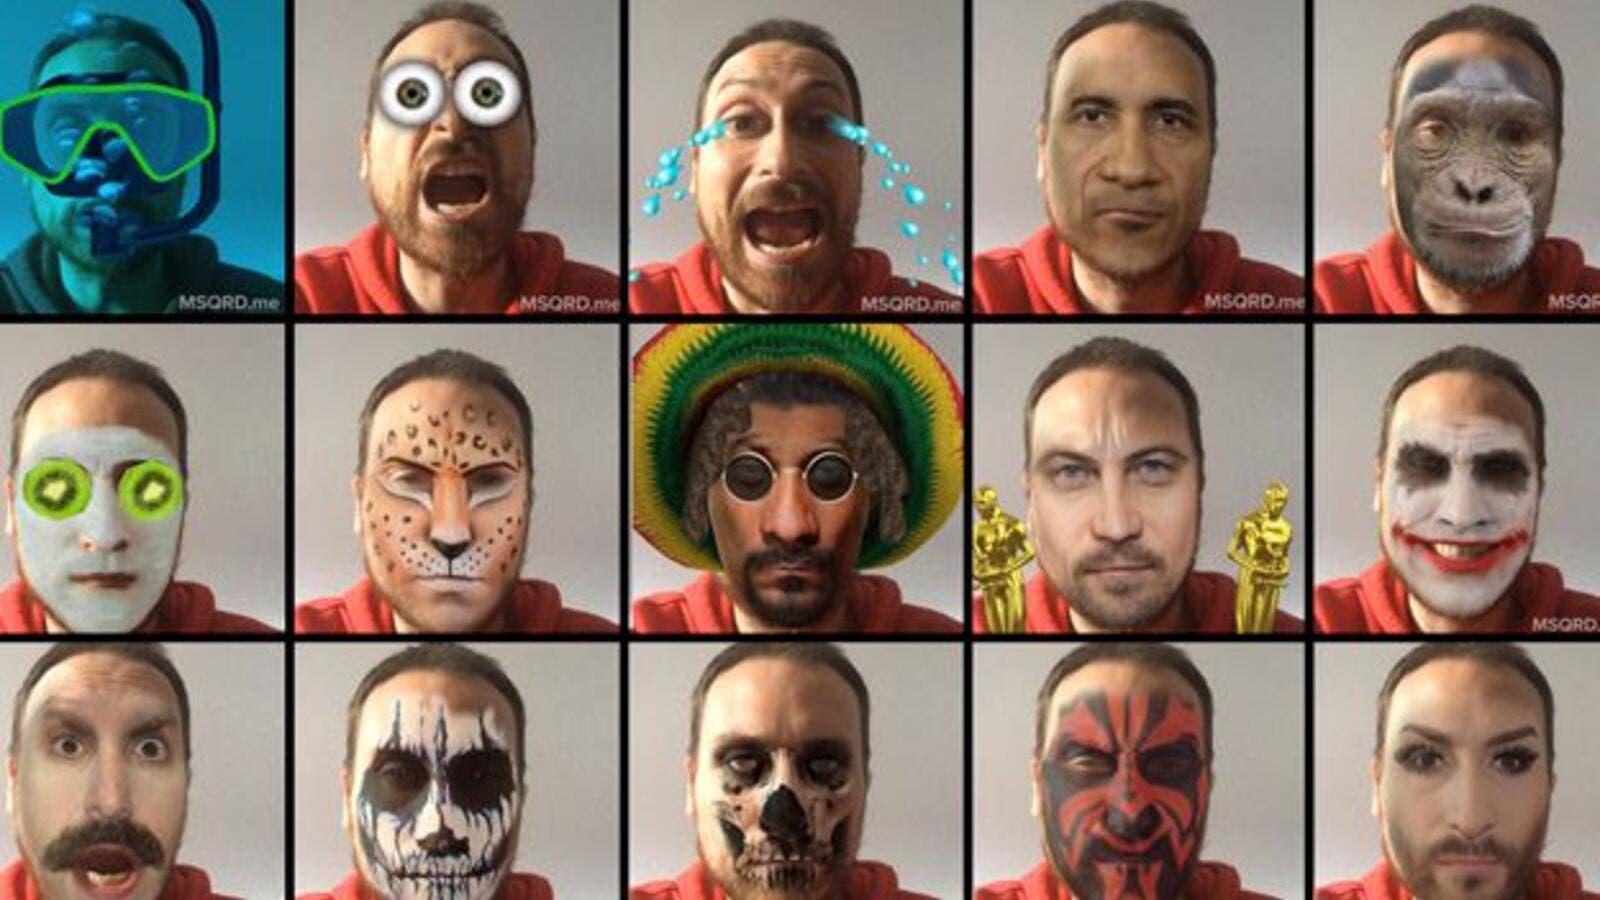 About Face: Facebook acquires face swap app | Al Bawaba